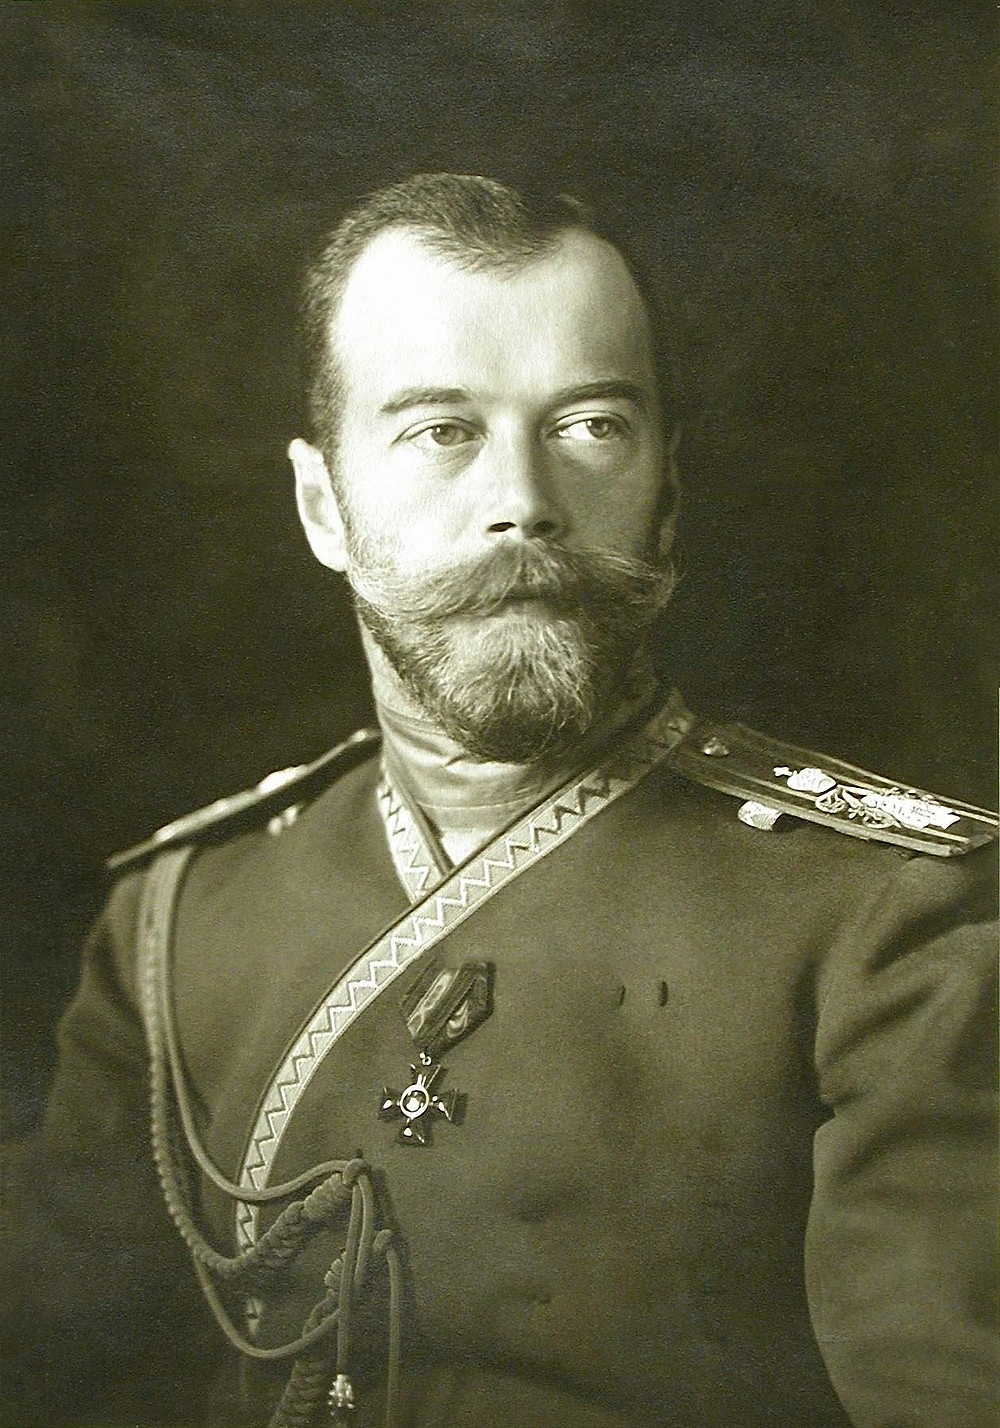 Nicholas II of Russia Image